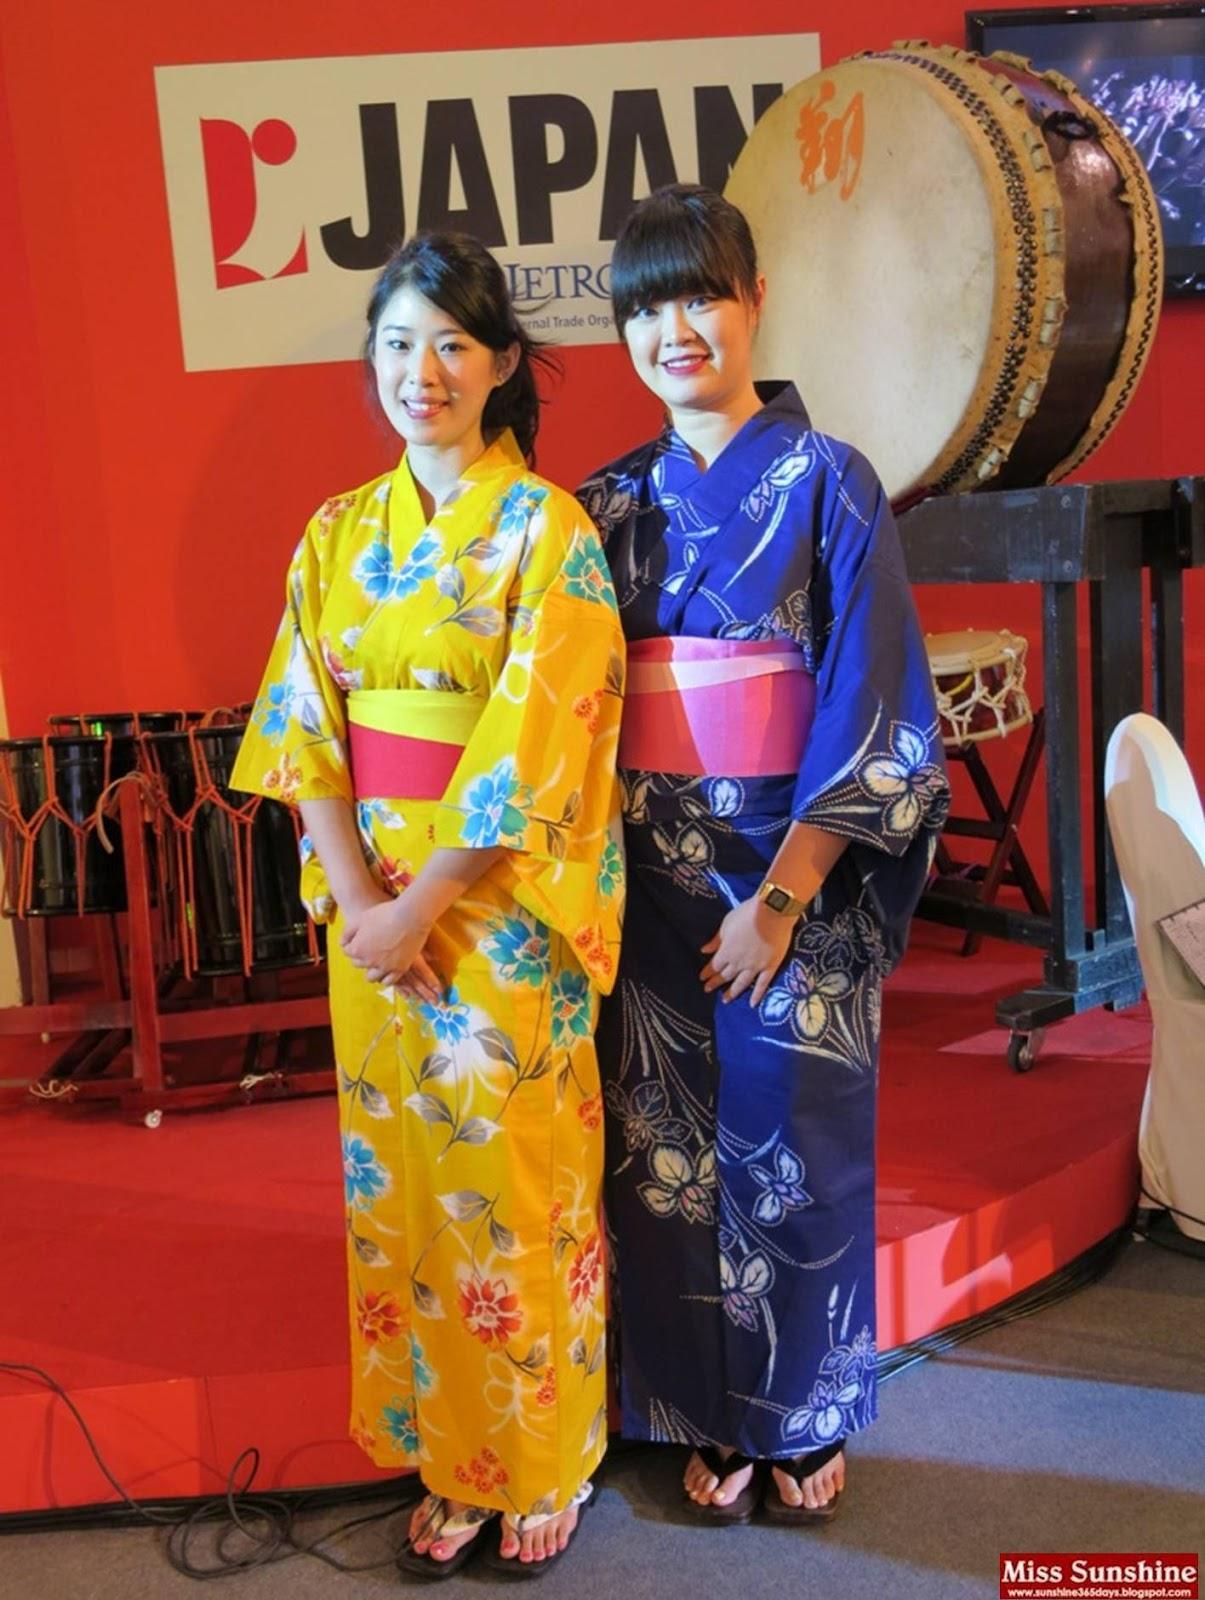 http://1.bp.blogspot.com/-WcyYKU8w75Q/UBBdOjosWjI/AAAAAAAALLI/S8Gt4OhC9j4/s1600/Tokyo+Street+Anni+2.jpg